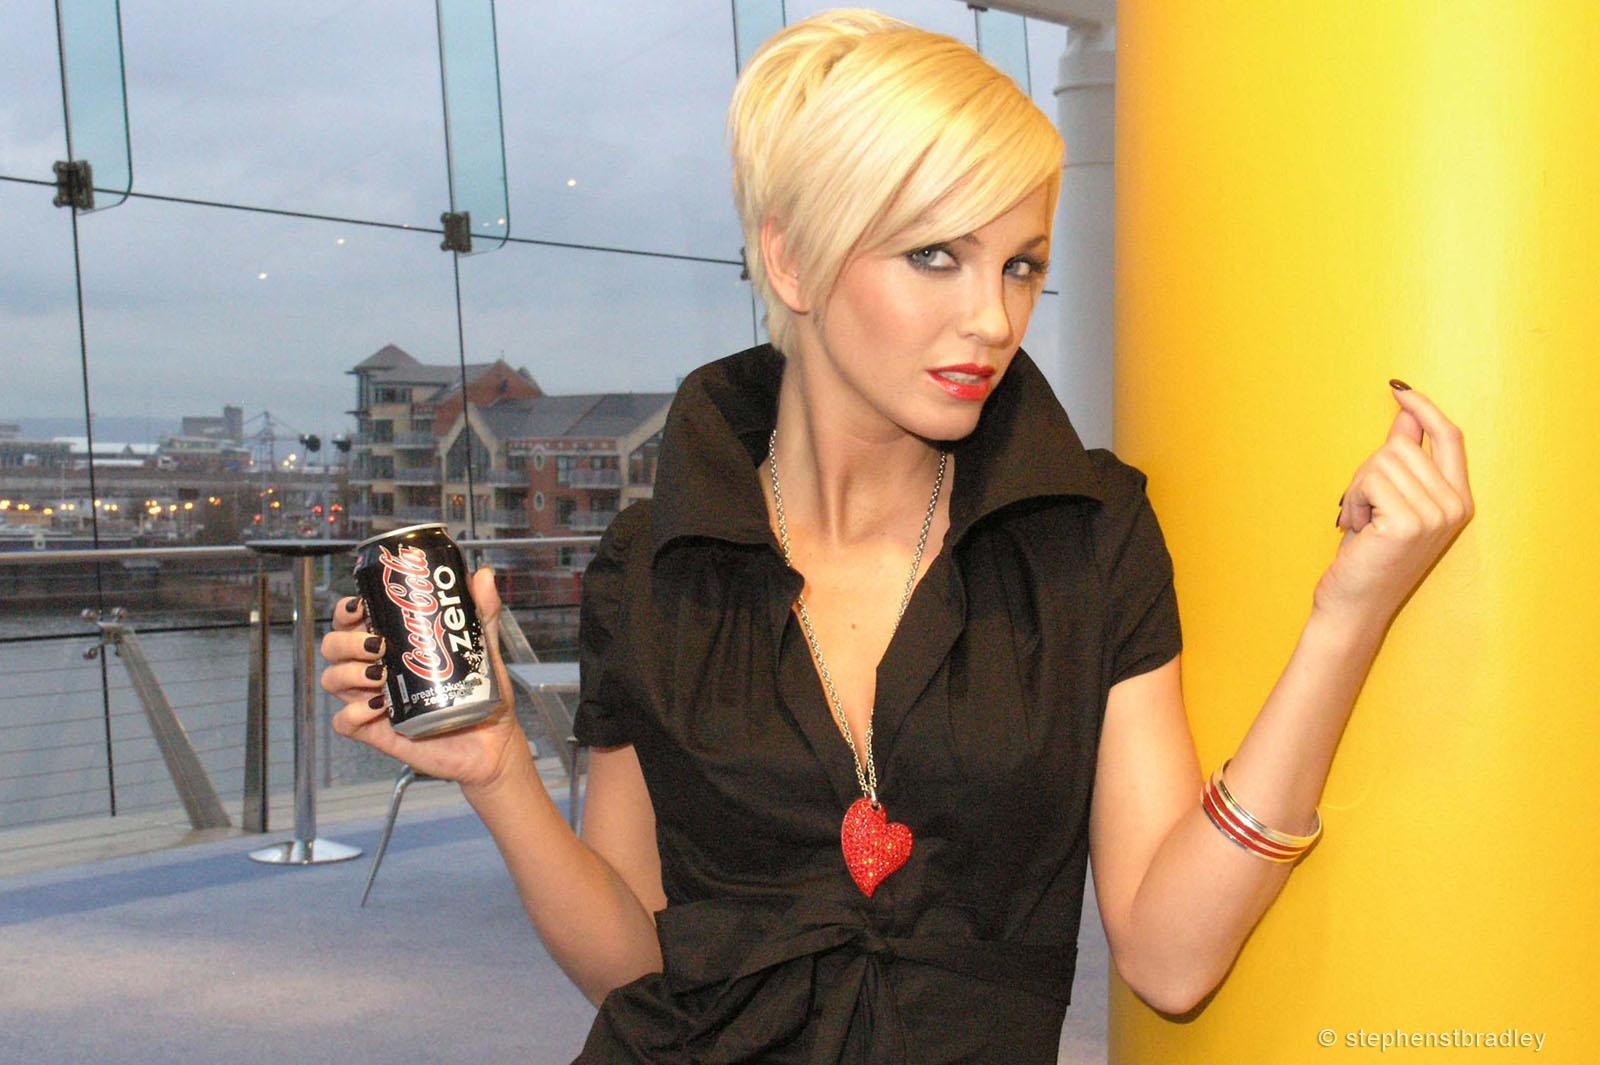 R Photographer Dublin Ireland photo 1014113 - Sarah Harding Girls Aloud promoting Coca Cola Zero for Edelman PR